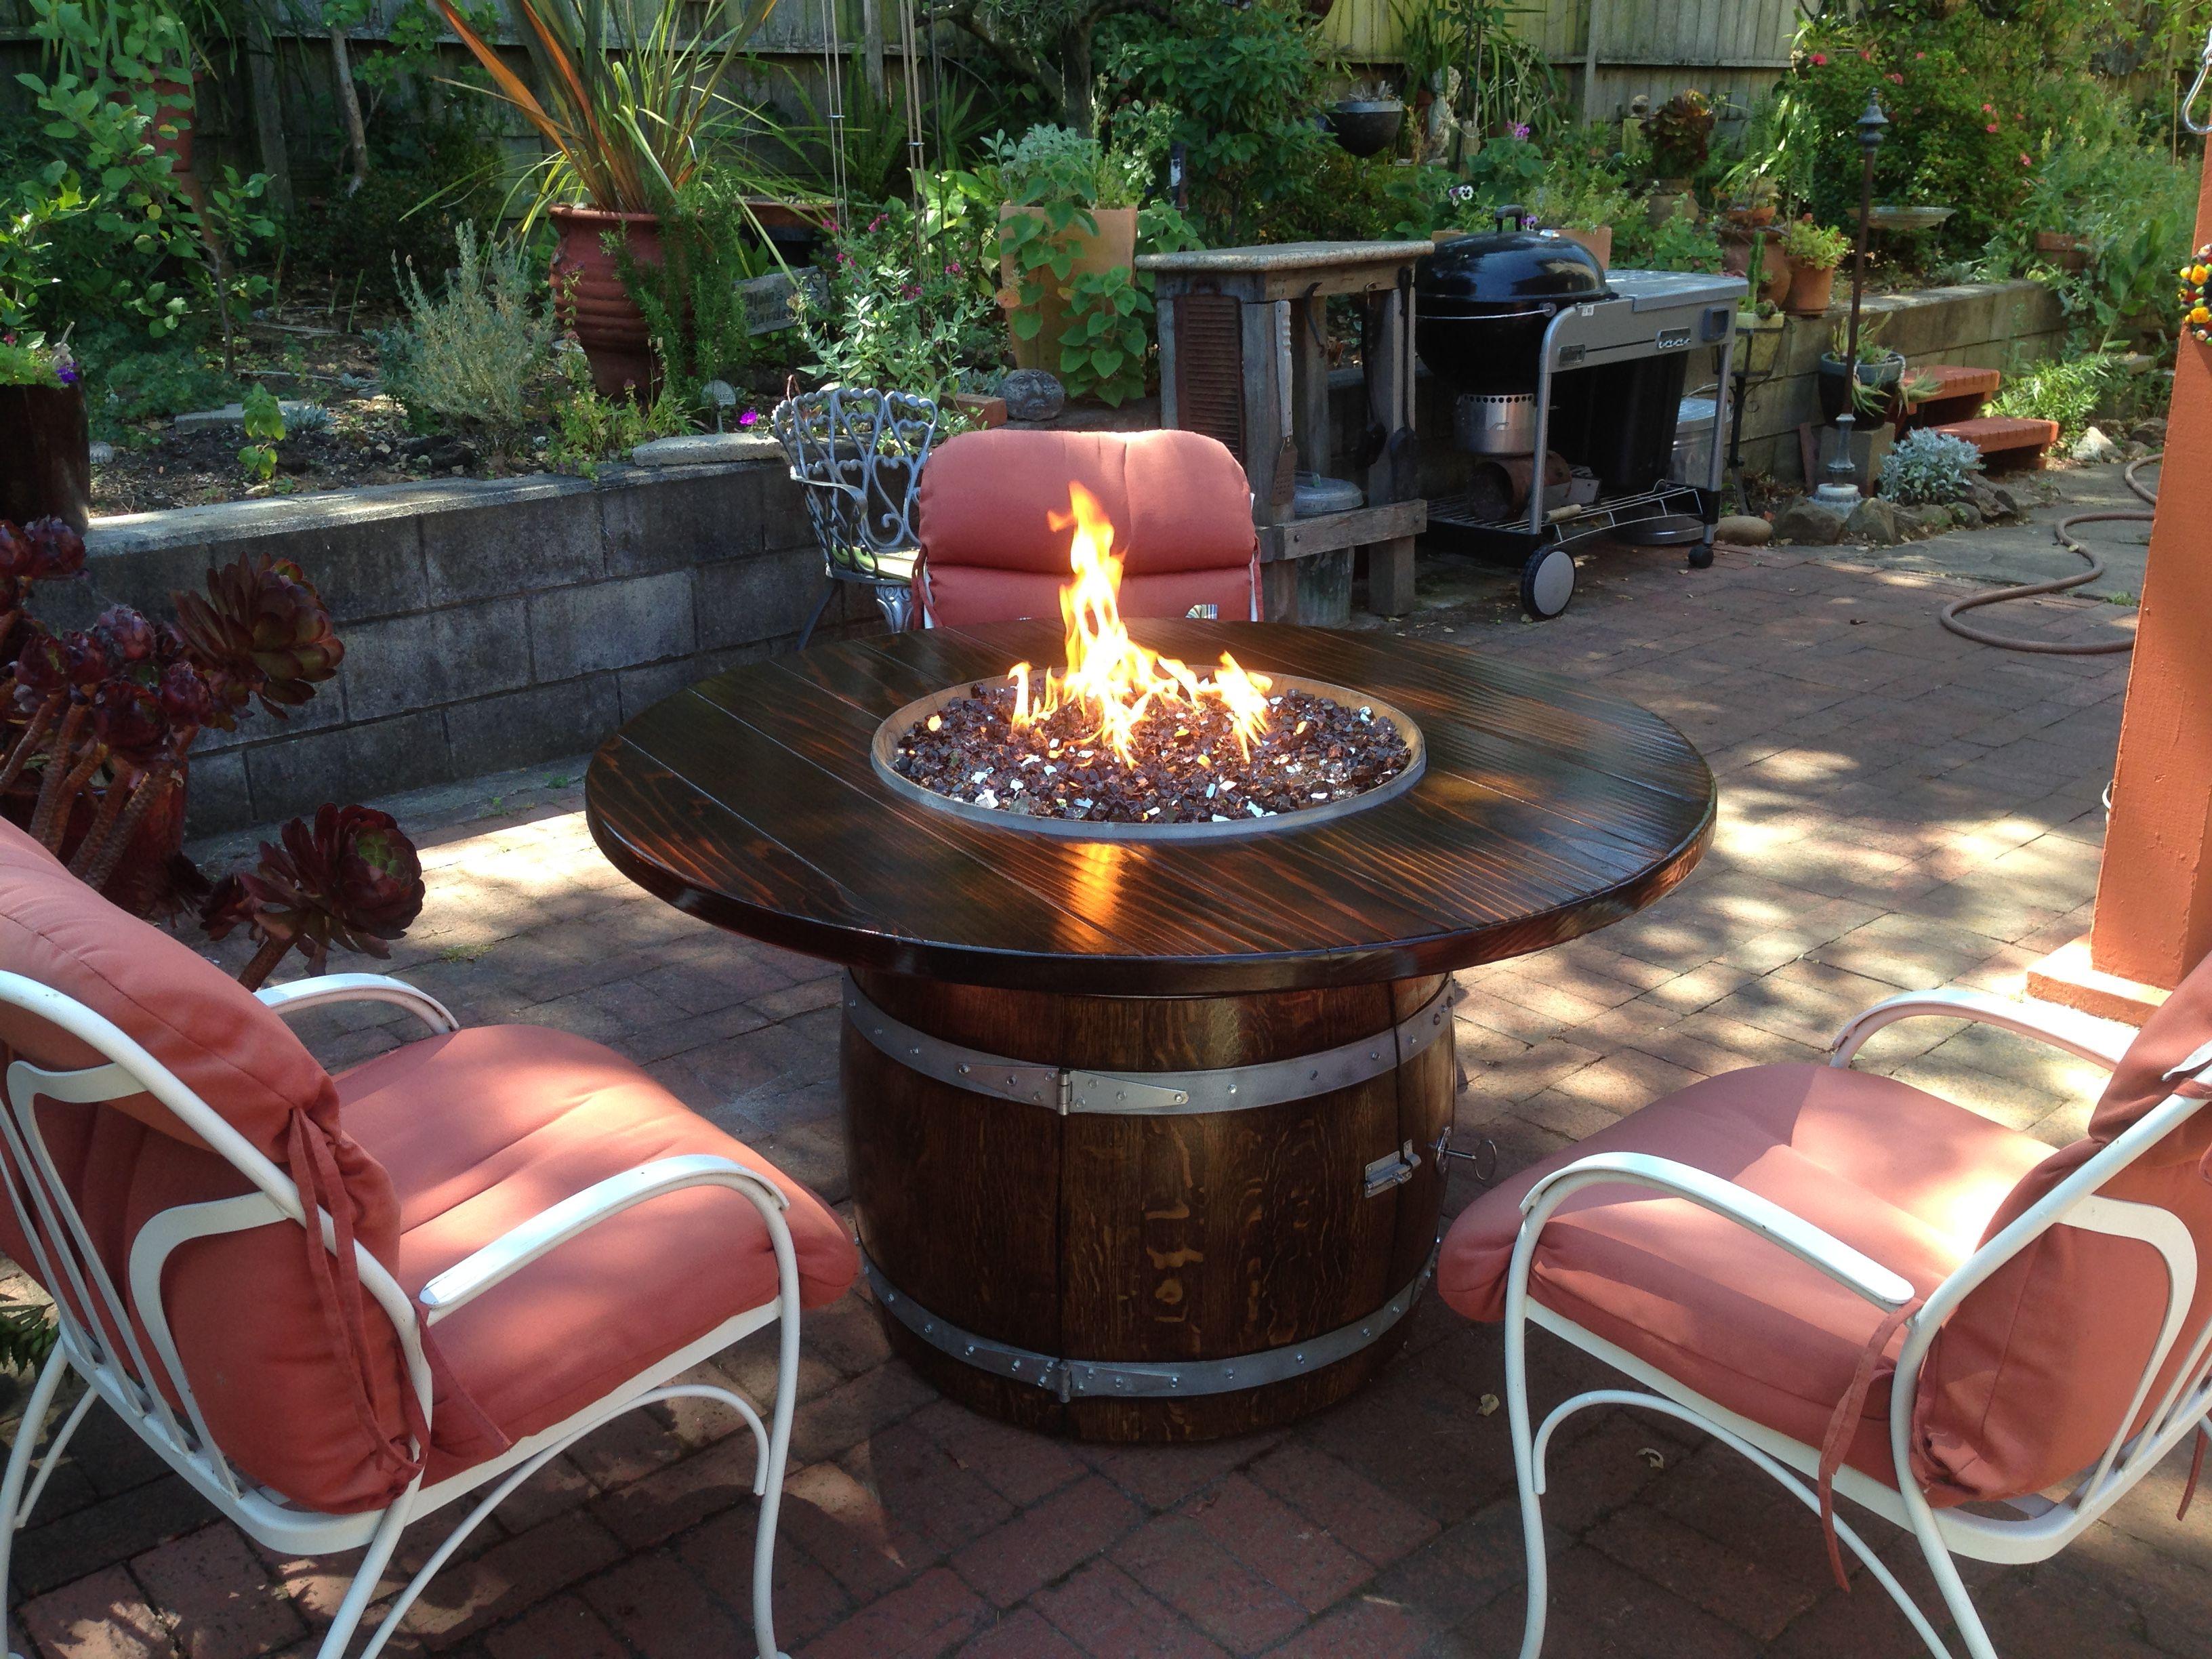 pin by pat moran on wine barrel fire table pinterest fire table